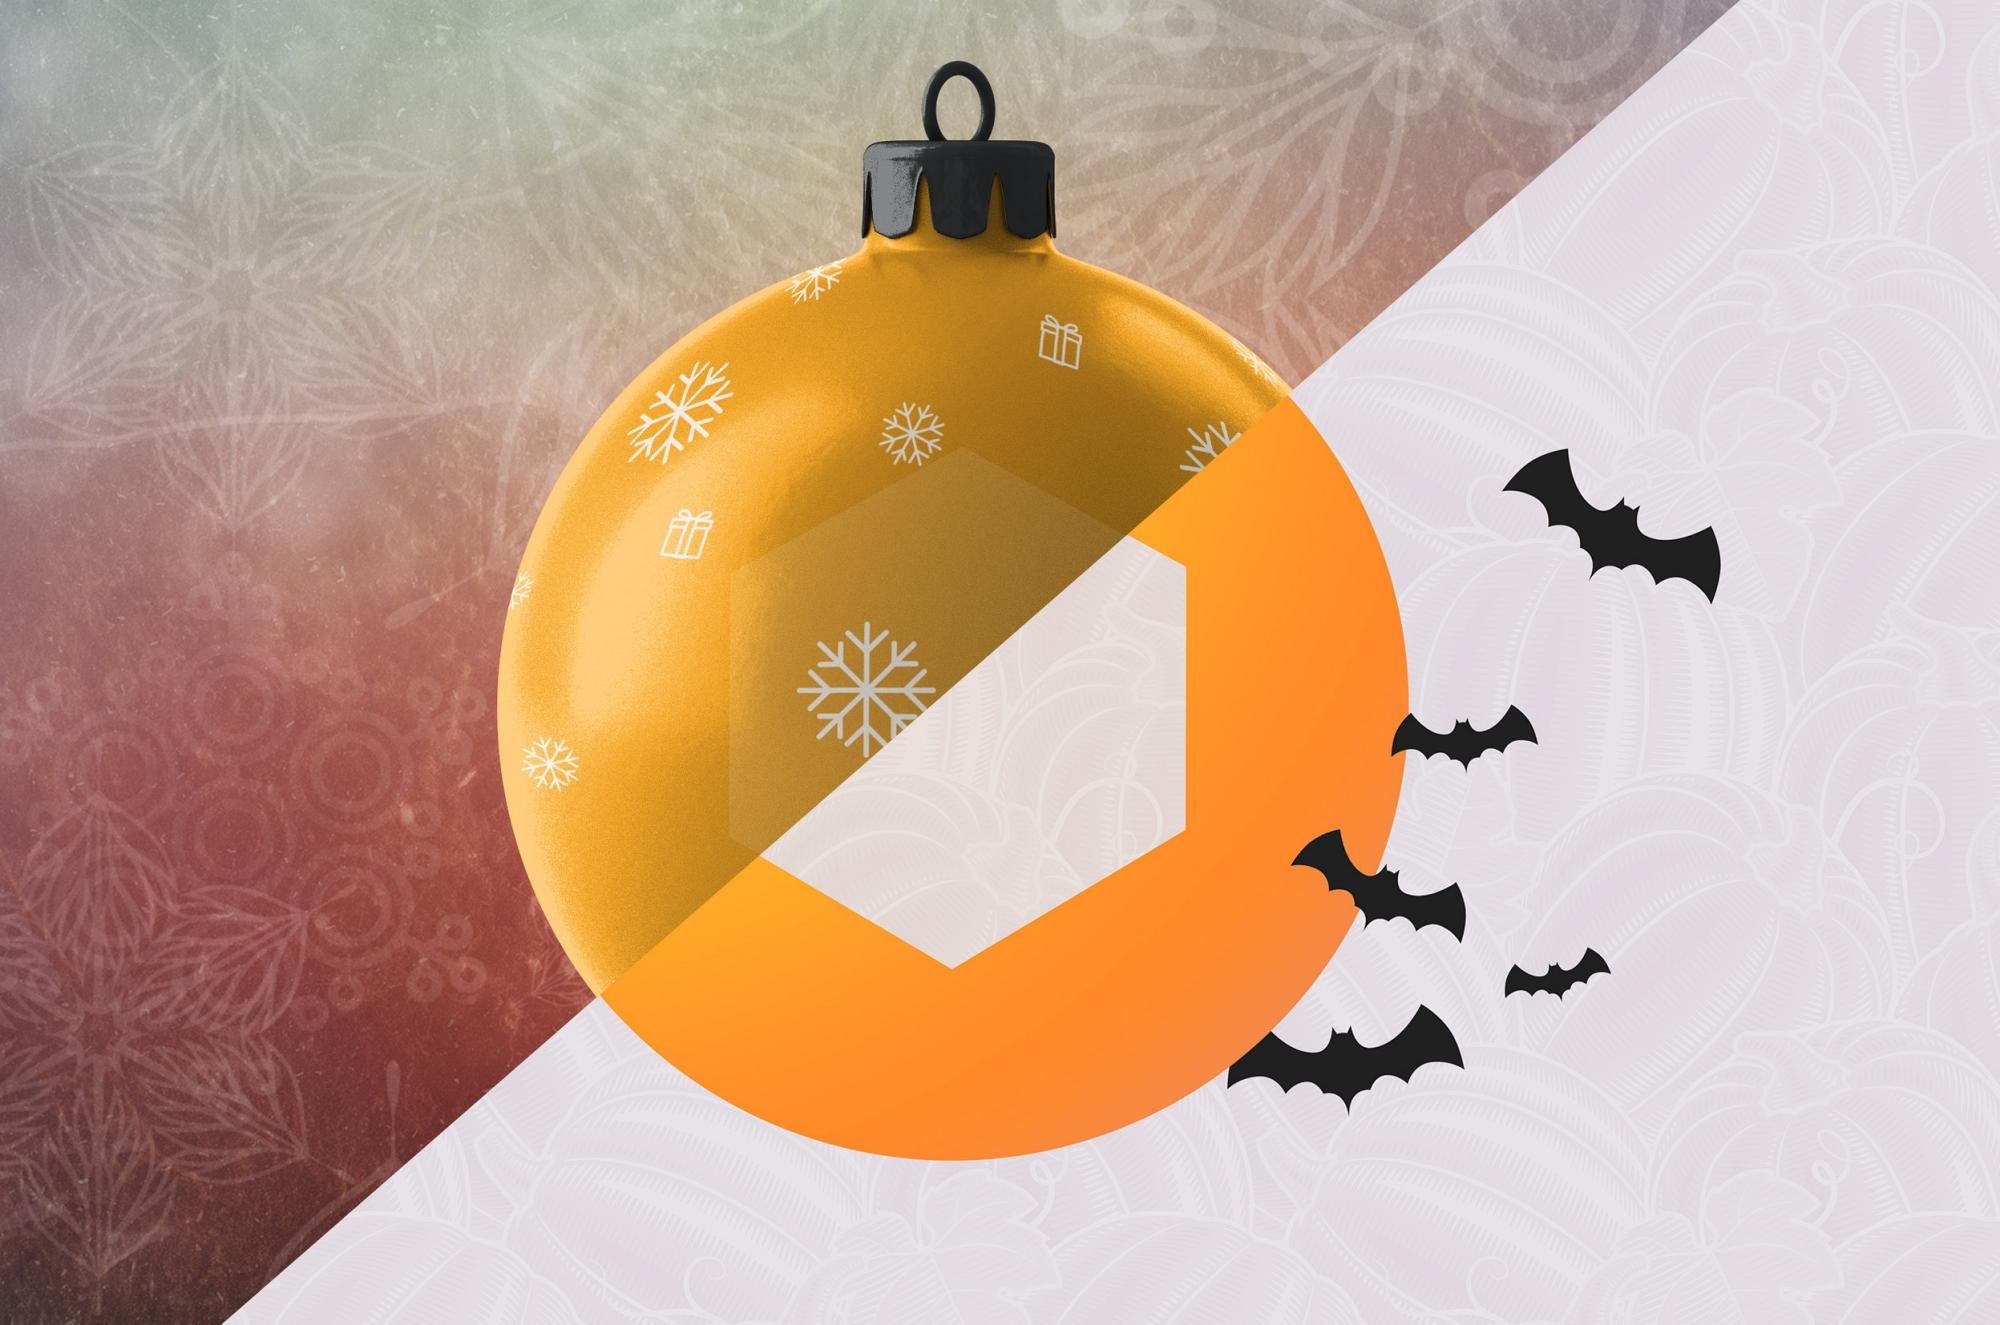 Seasonal website holiday promotion themes